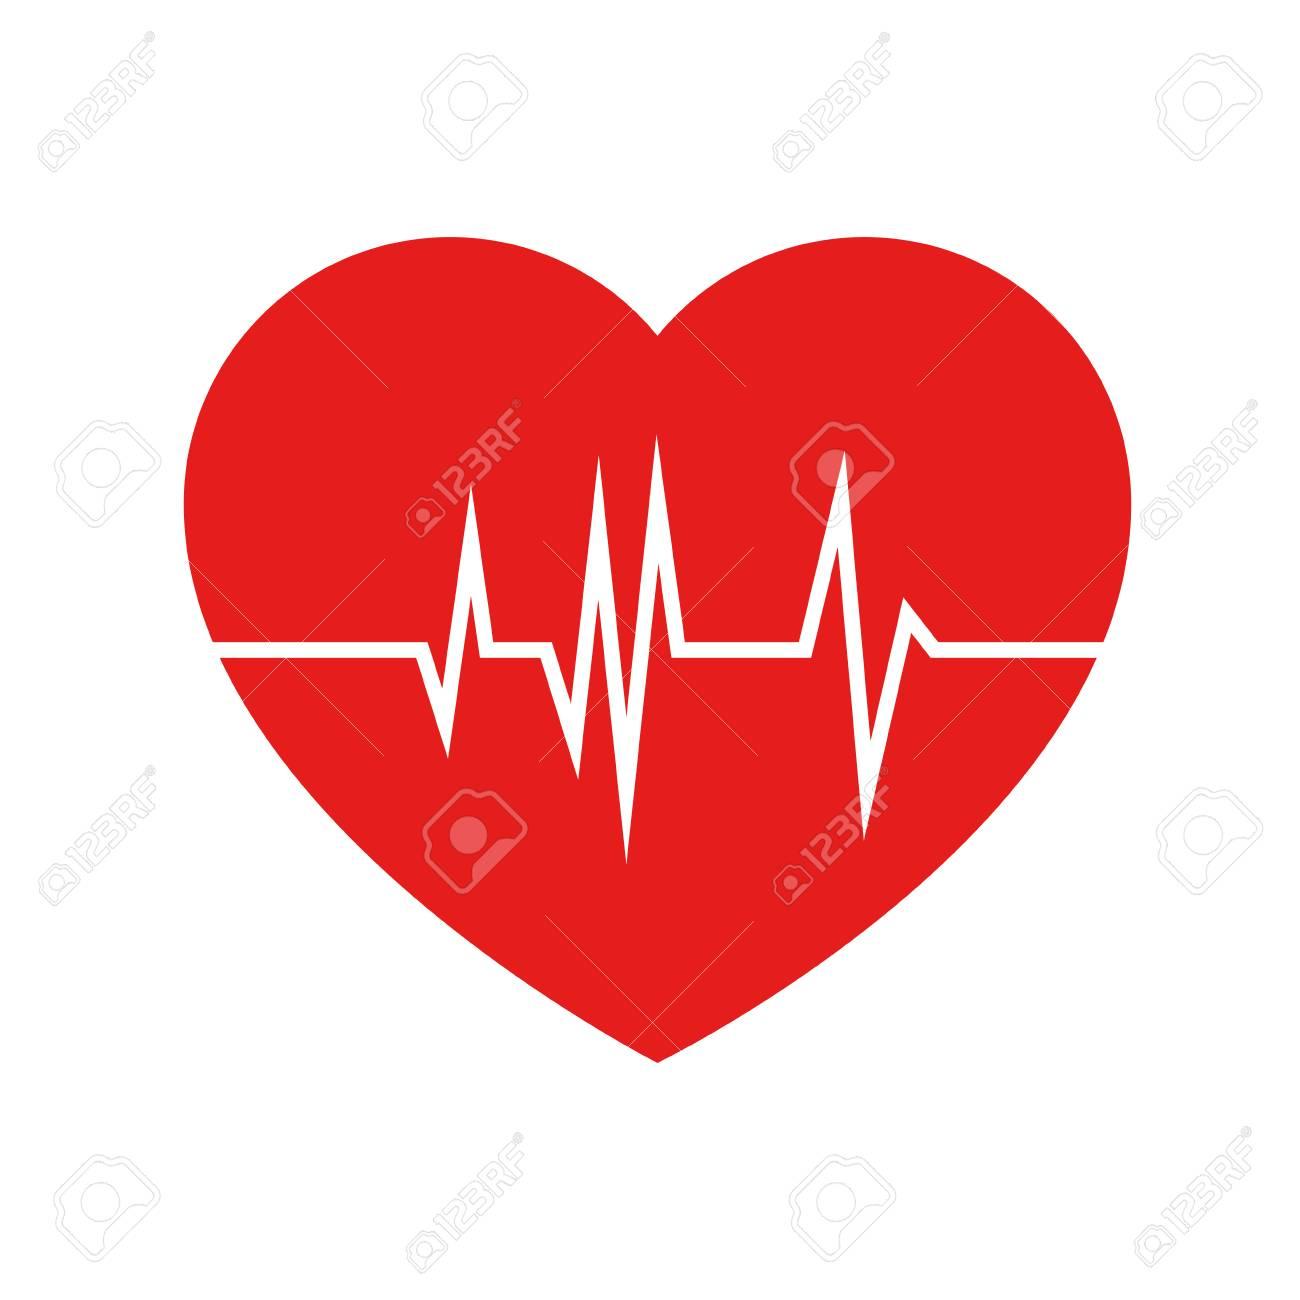 heart cardio isolated icon vector illustration design - 94433235